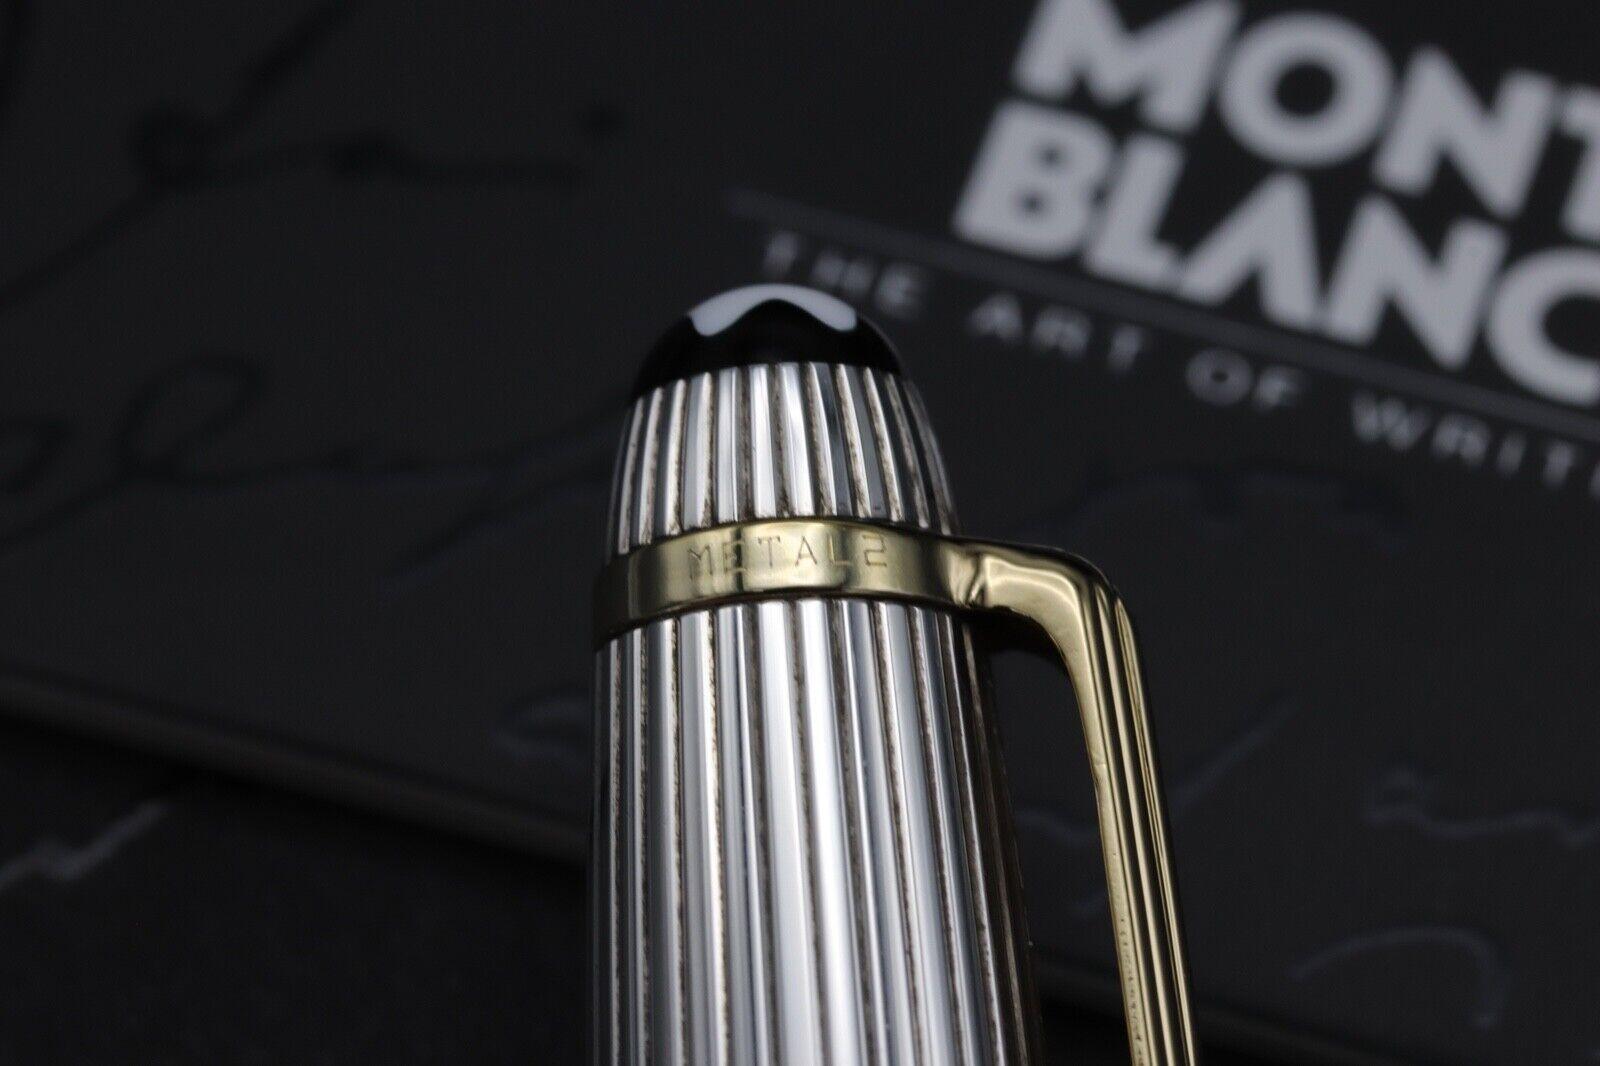 Montblanc Meisterstuck Solitaire Doue AG925 163 Classique Rollerball Pen 6